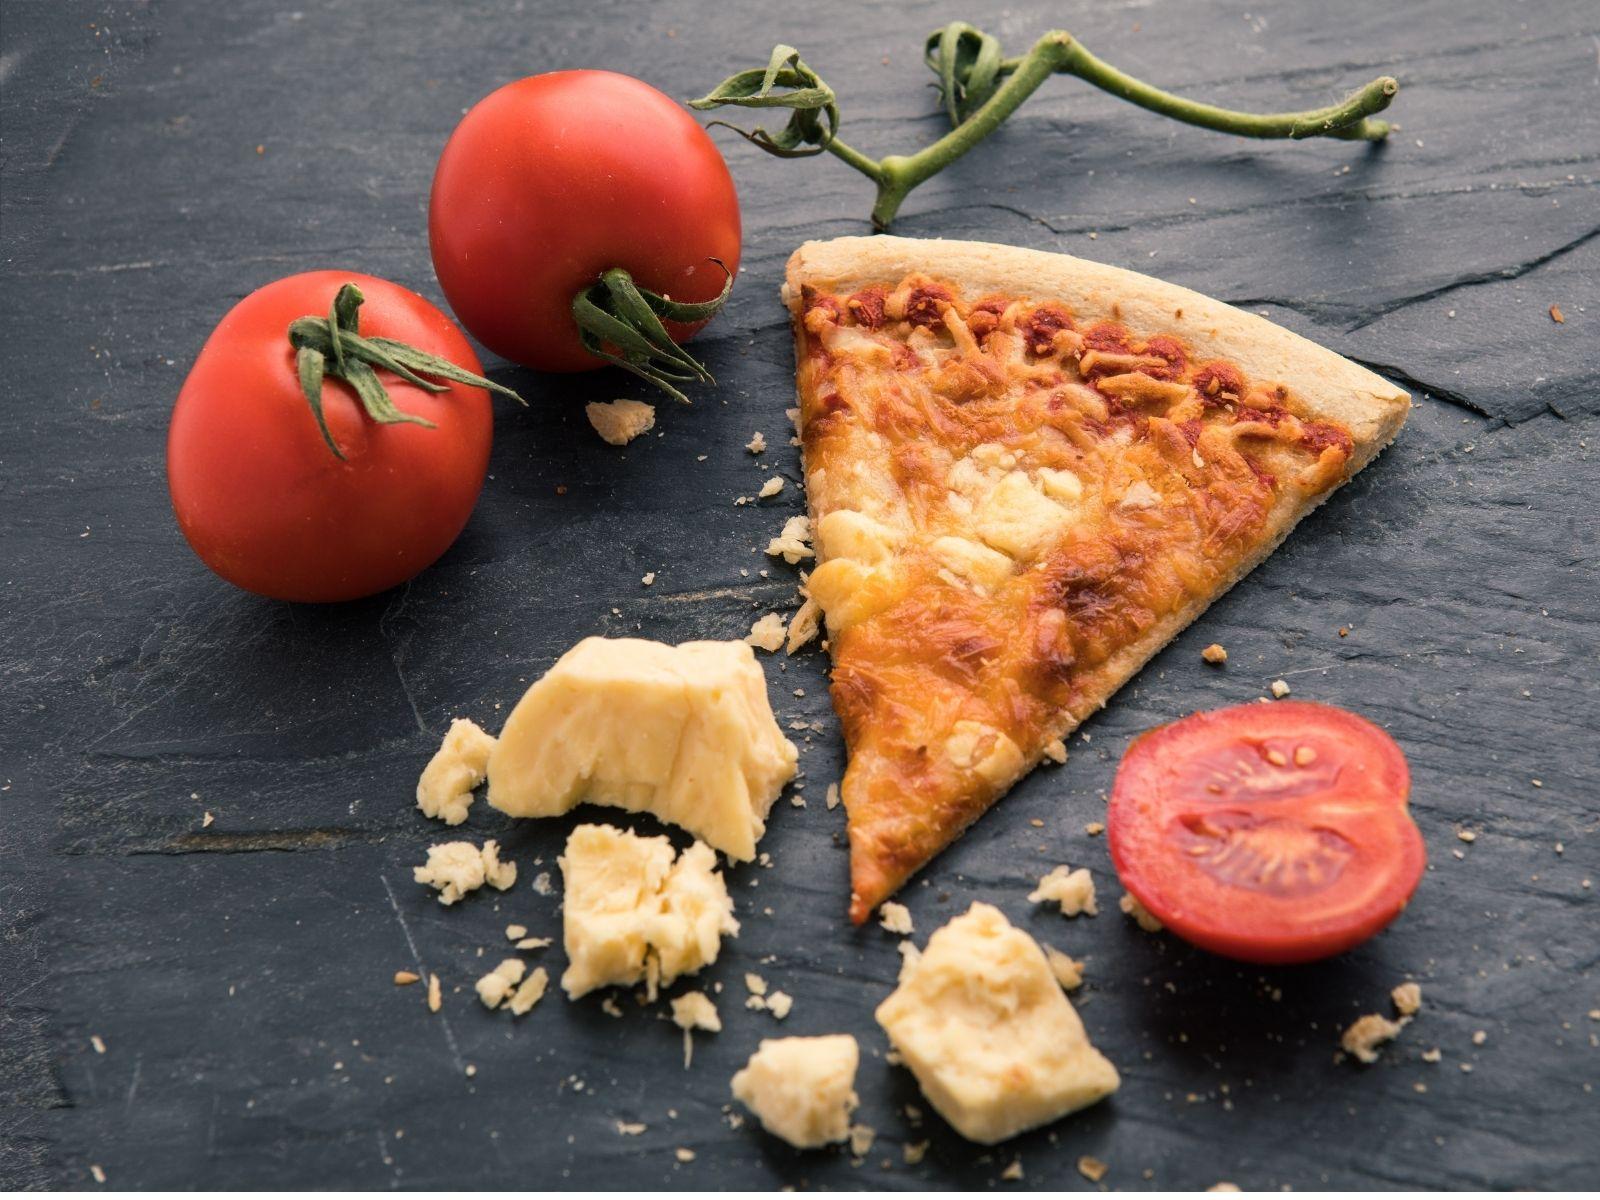 Pizza fromage à Niort et Chauray - Vincenzo Pizza